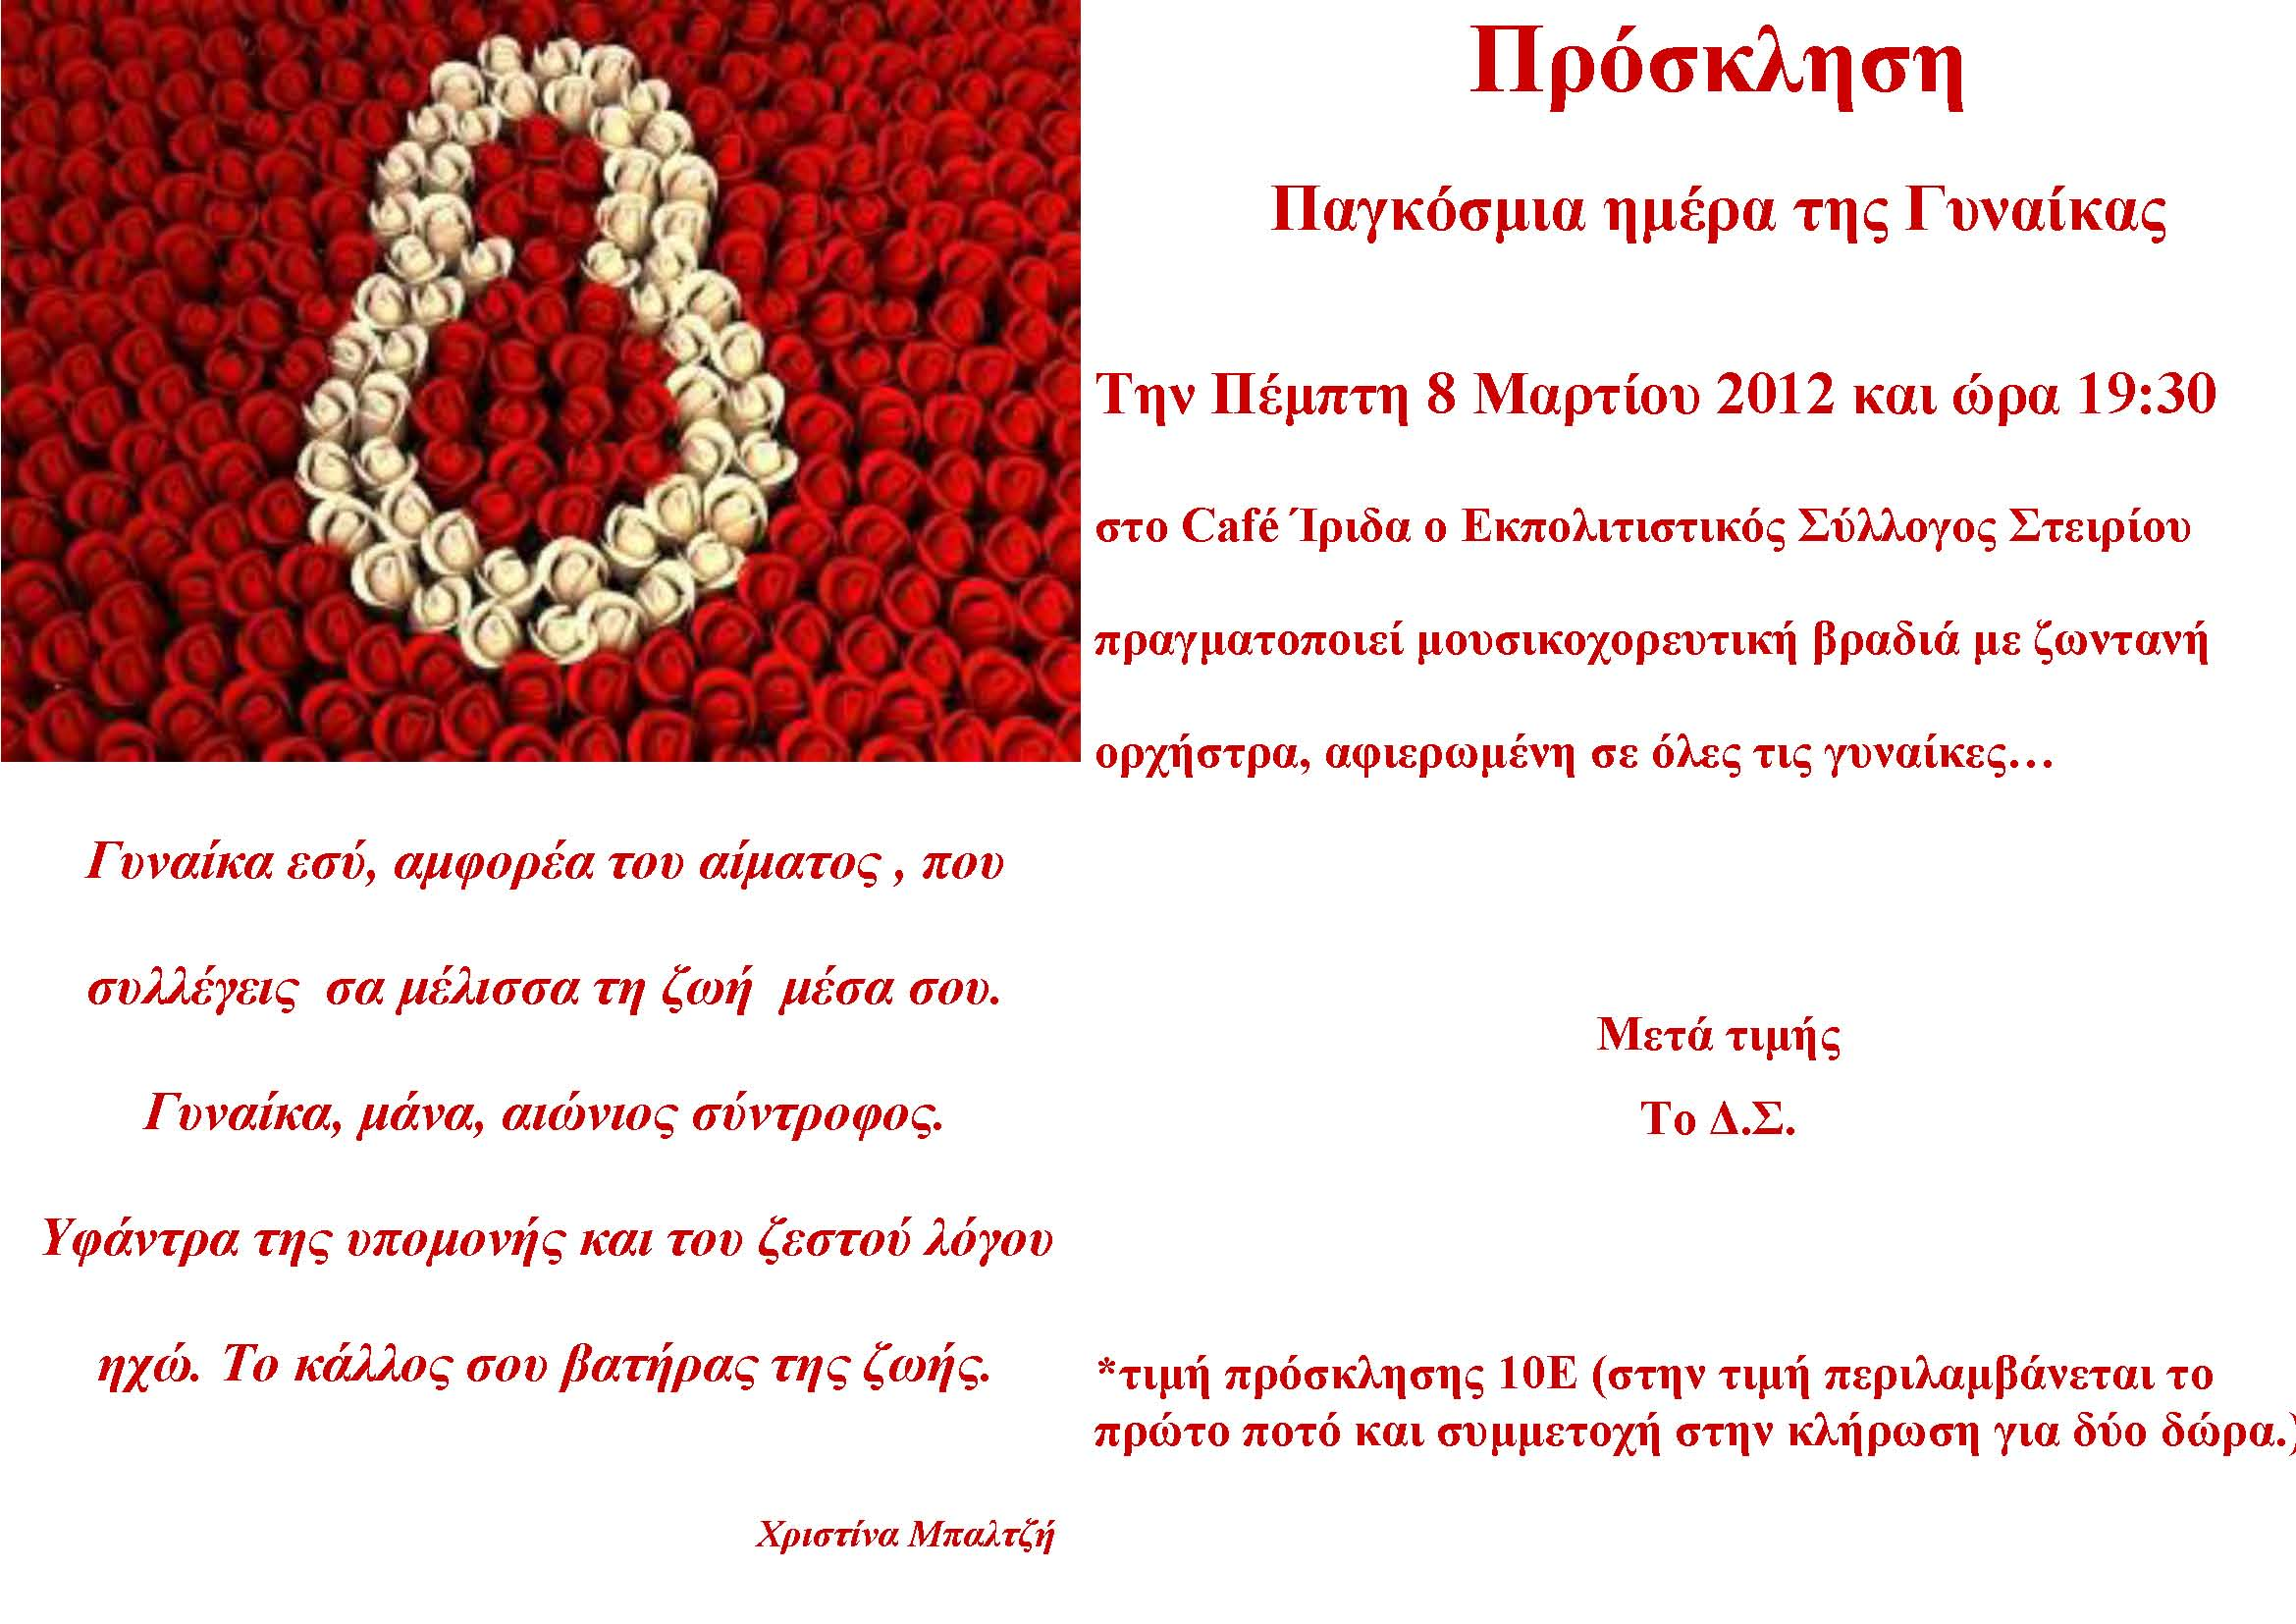 http://steirida1.files.wordpress.com/2012/03/ceb3cf85cebdceb1ceafcebaceb1-ceb5cf83cf8d-ceb1cf86ceb9cf83ceb12_page_12.jpg